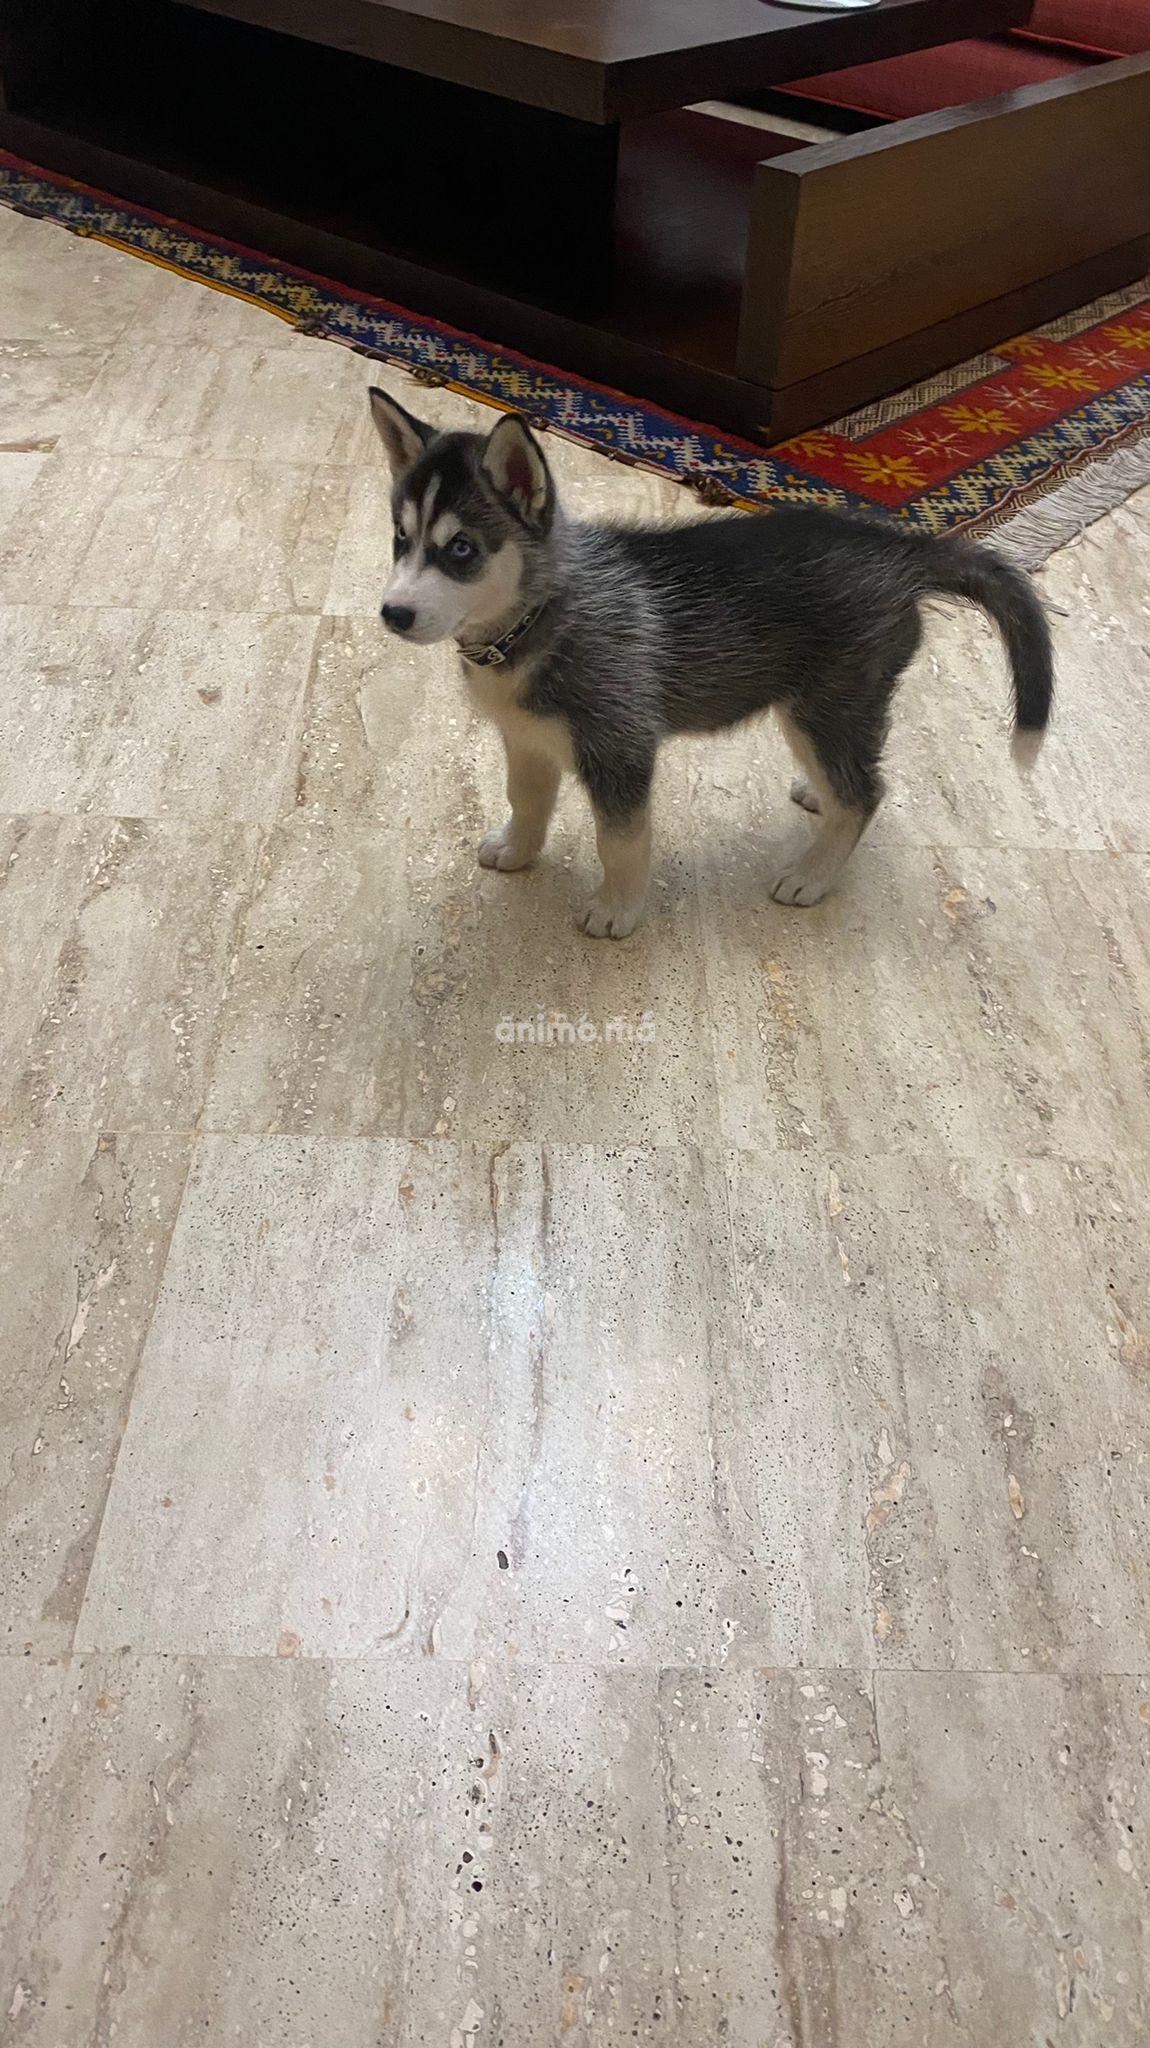 Animo - Vend husky 2 mois